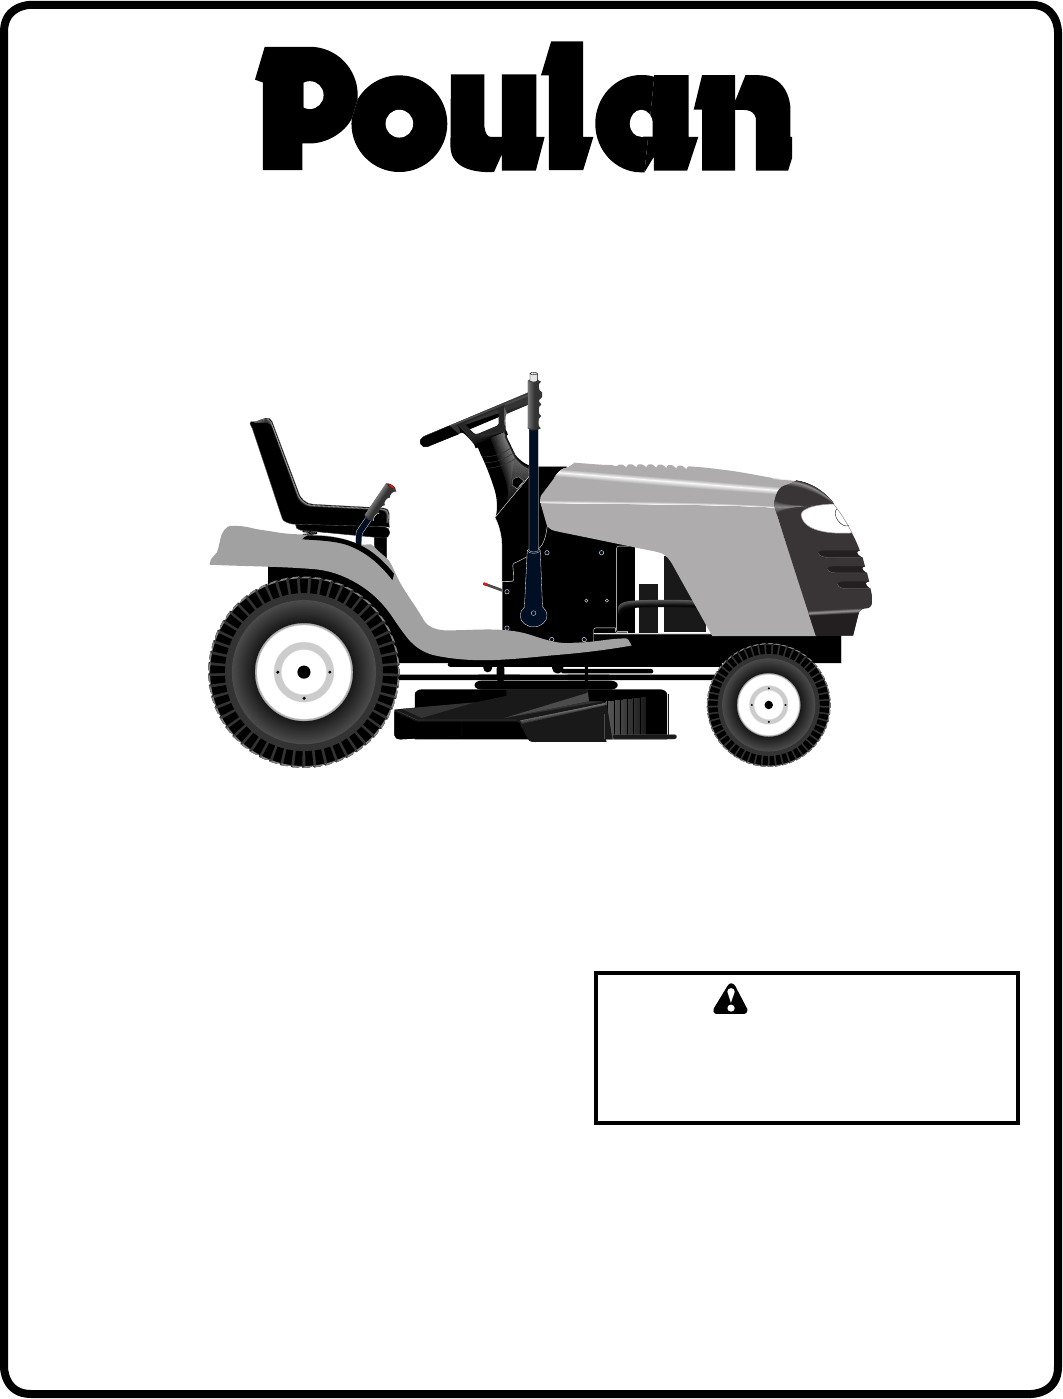 Poulan PB1638LT Lawn Mower User Manual